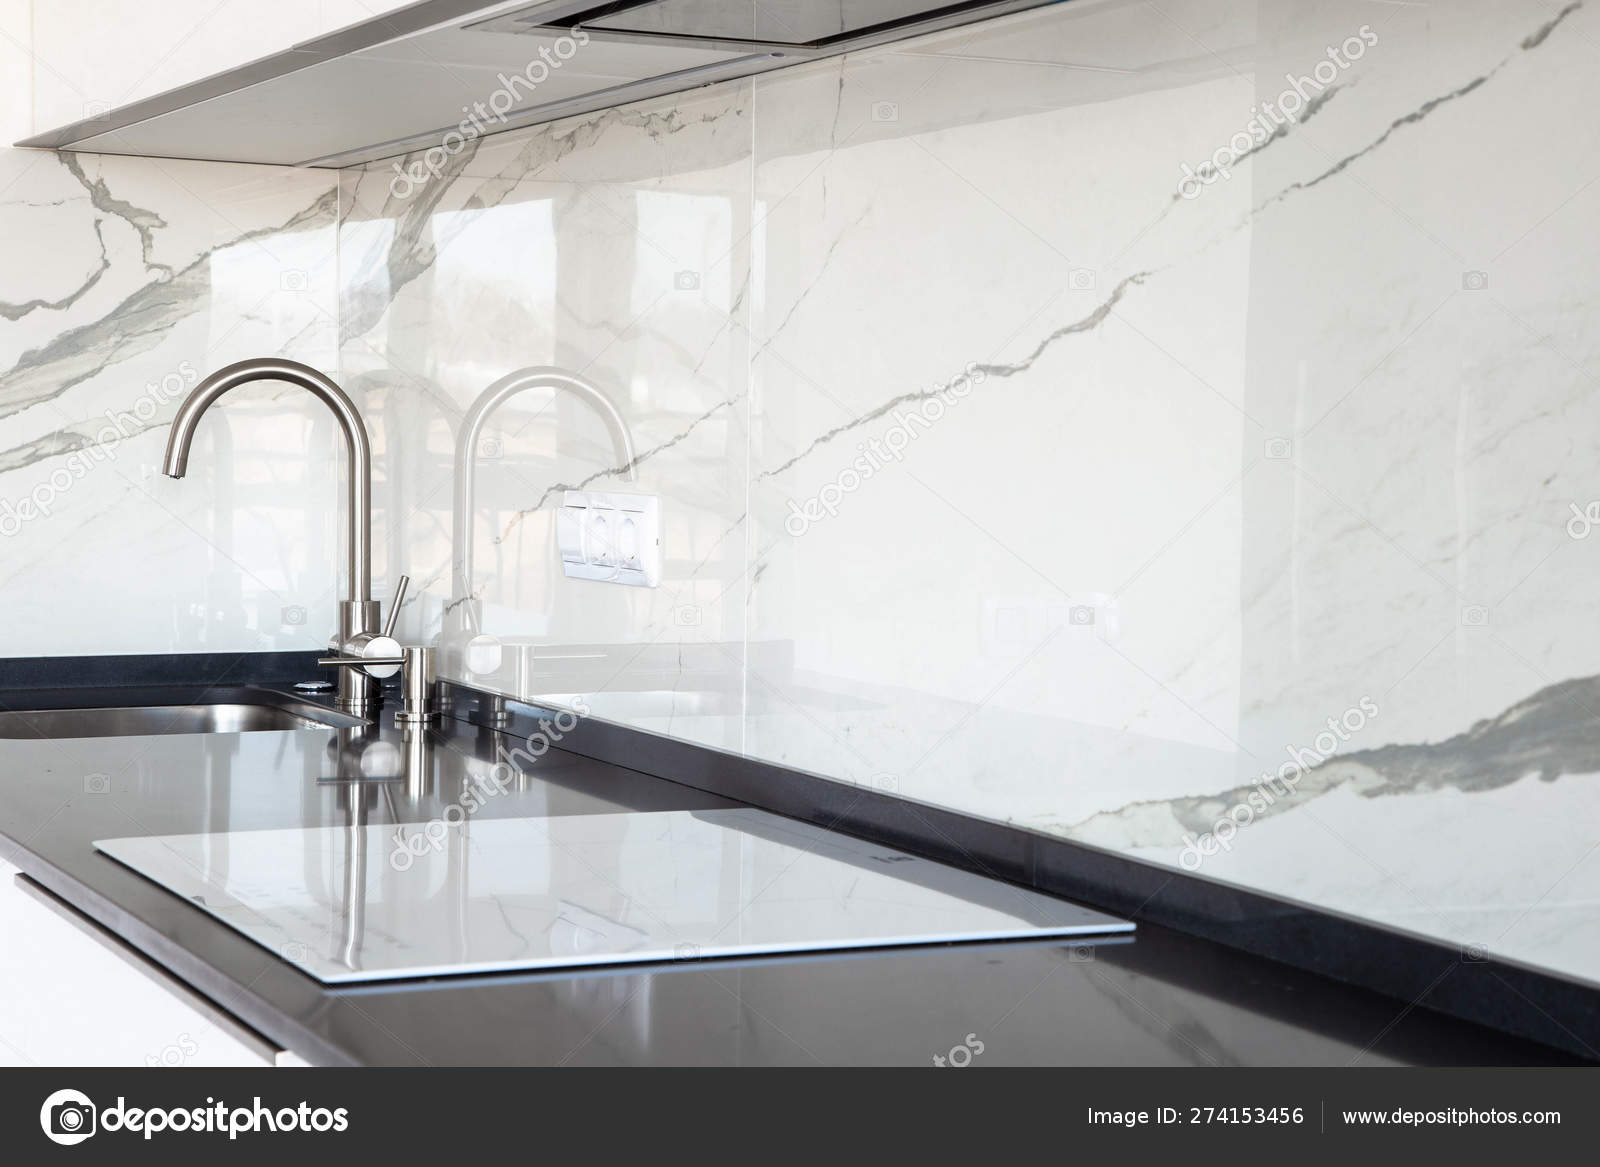 Close White Glossy Kitchen Black Quartz Countertop Marble Tile Backsplash Stock Photo C Rois010 274153456